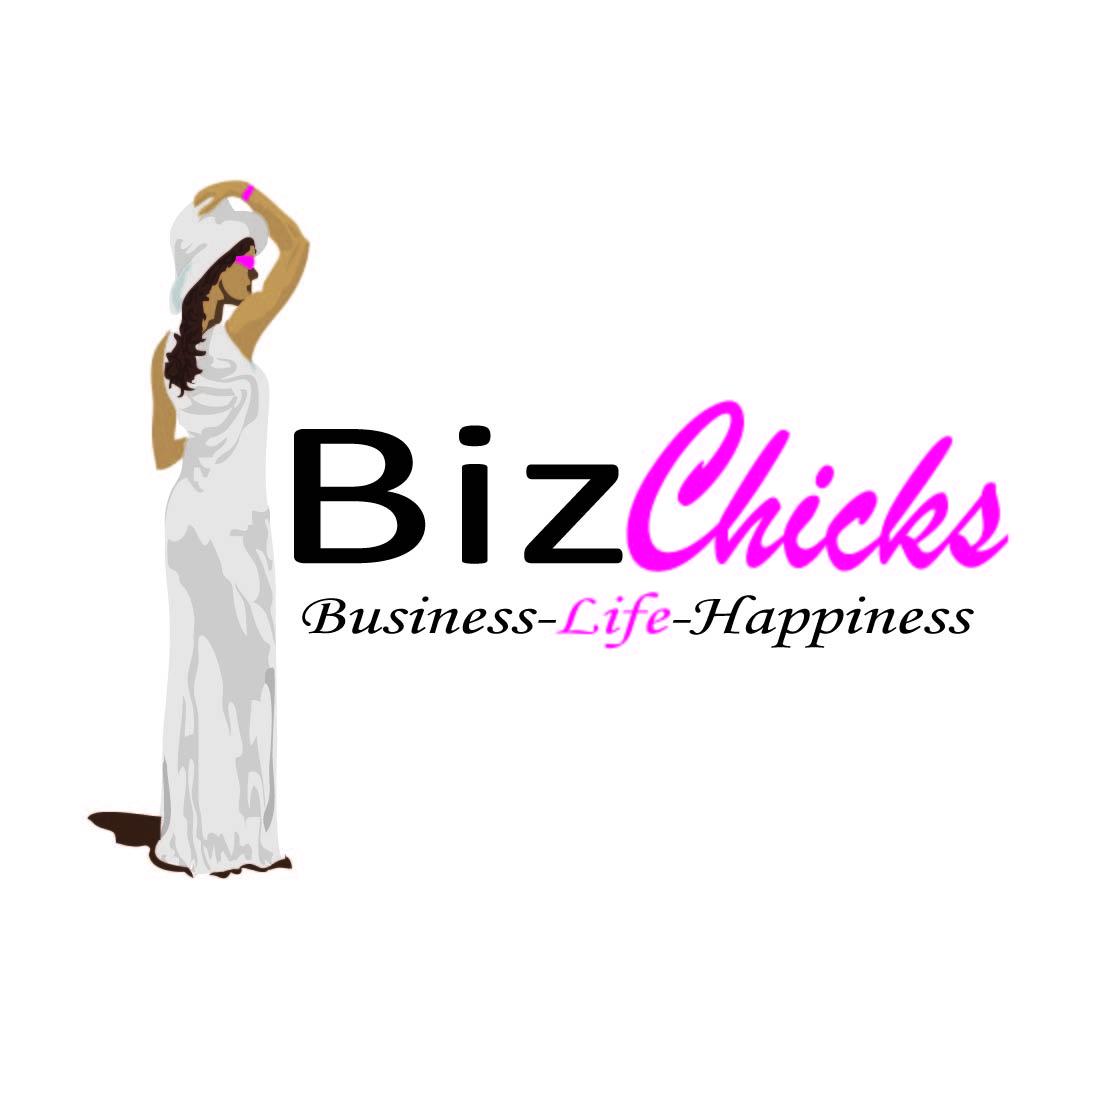 Logo Design by Saunter - Entry No. 26 in the Logo Design Contest BizChicks e-magazine.